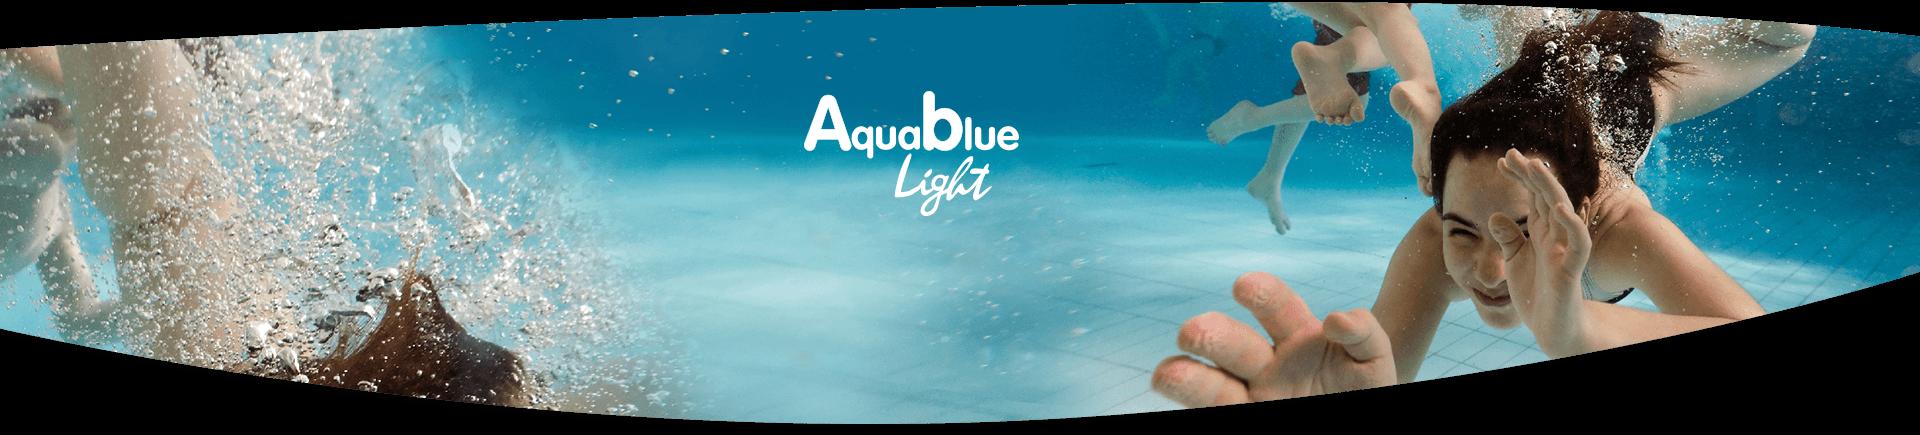 Pool salt system Aqua Blue light